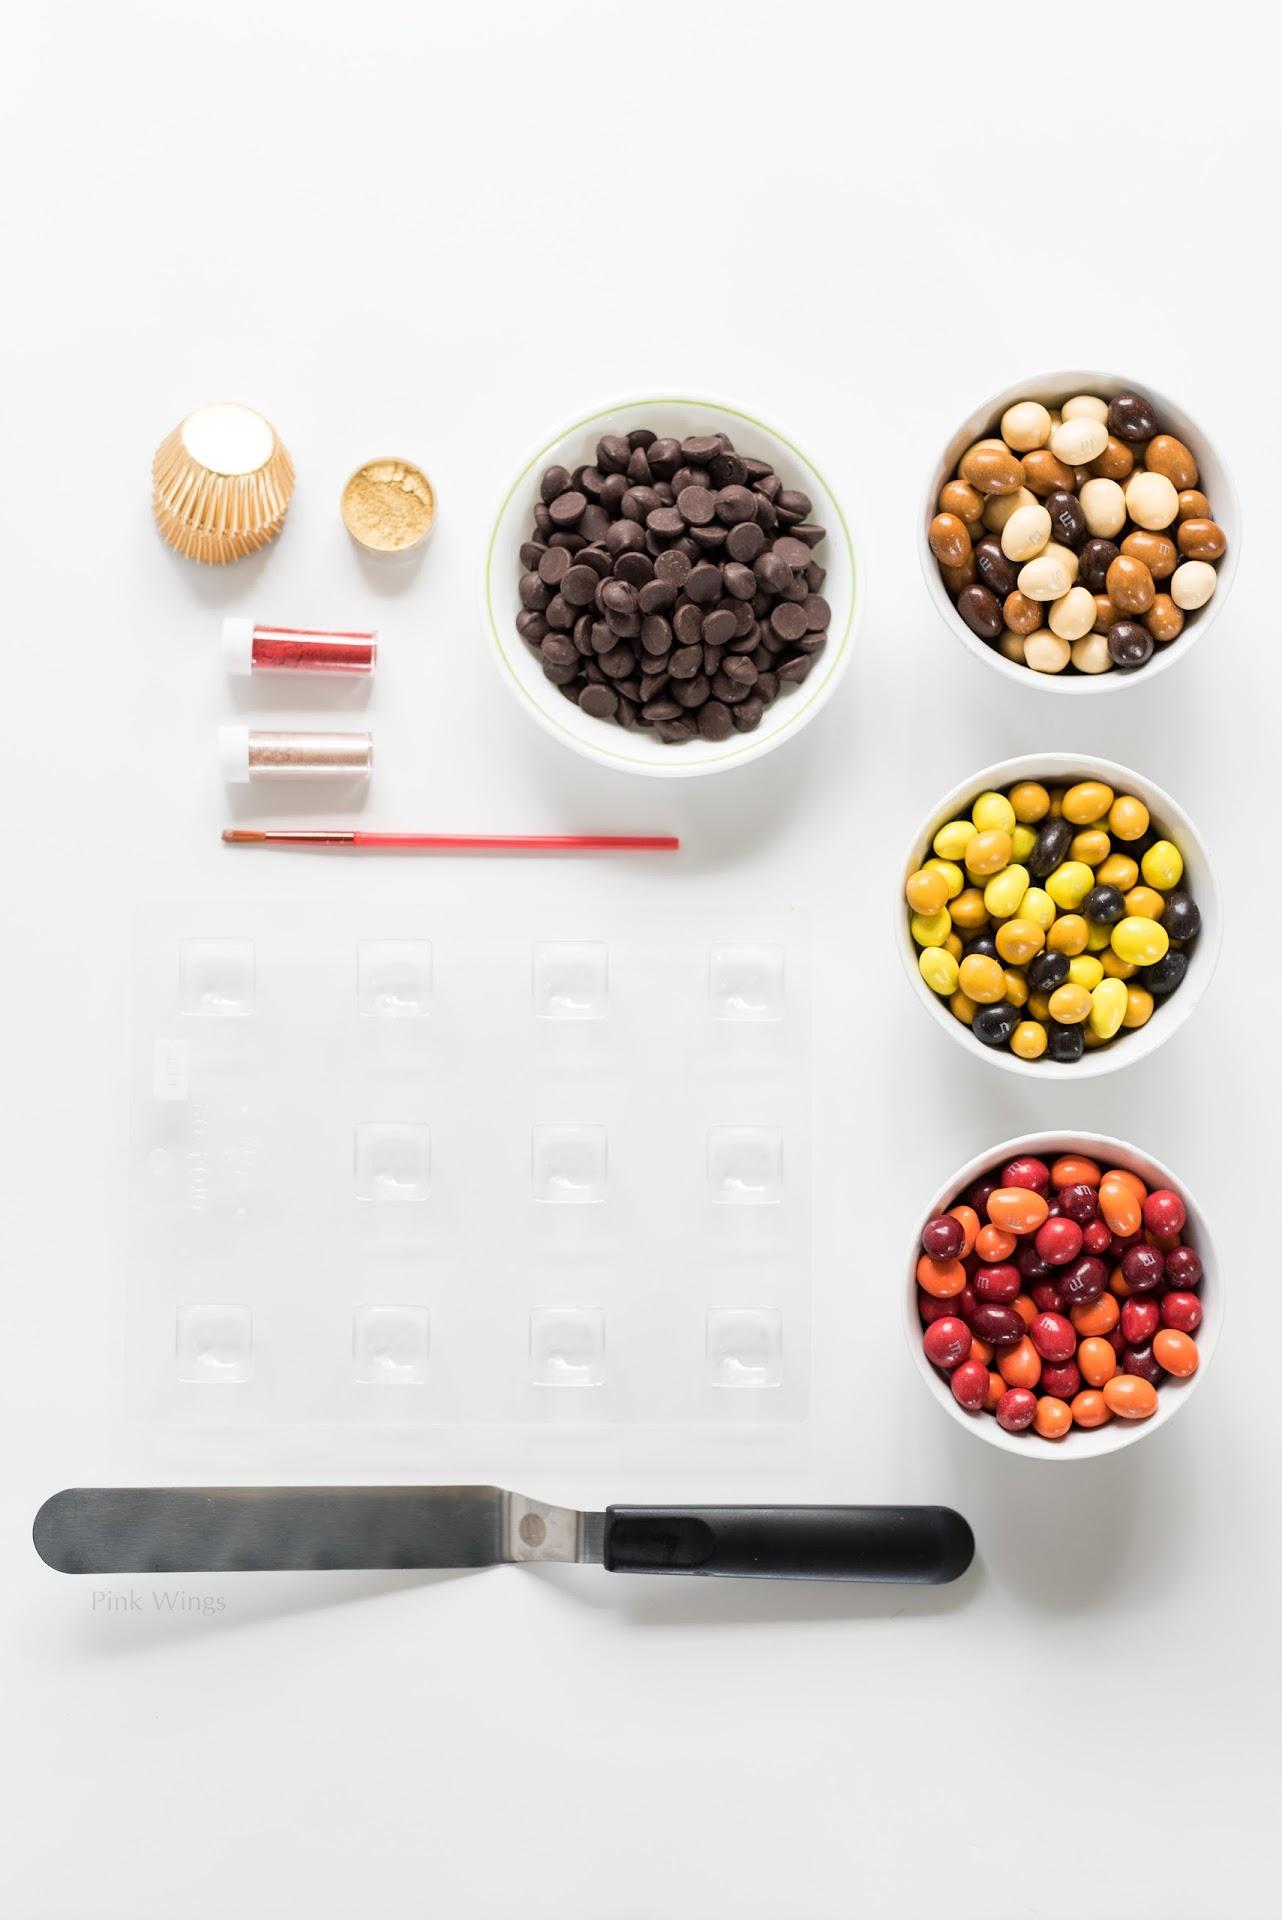 peanut chocolates, how to make chocolates at home, gourmet chocolates at home, chocolates with a mold, how to decorate chocolates